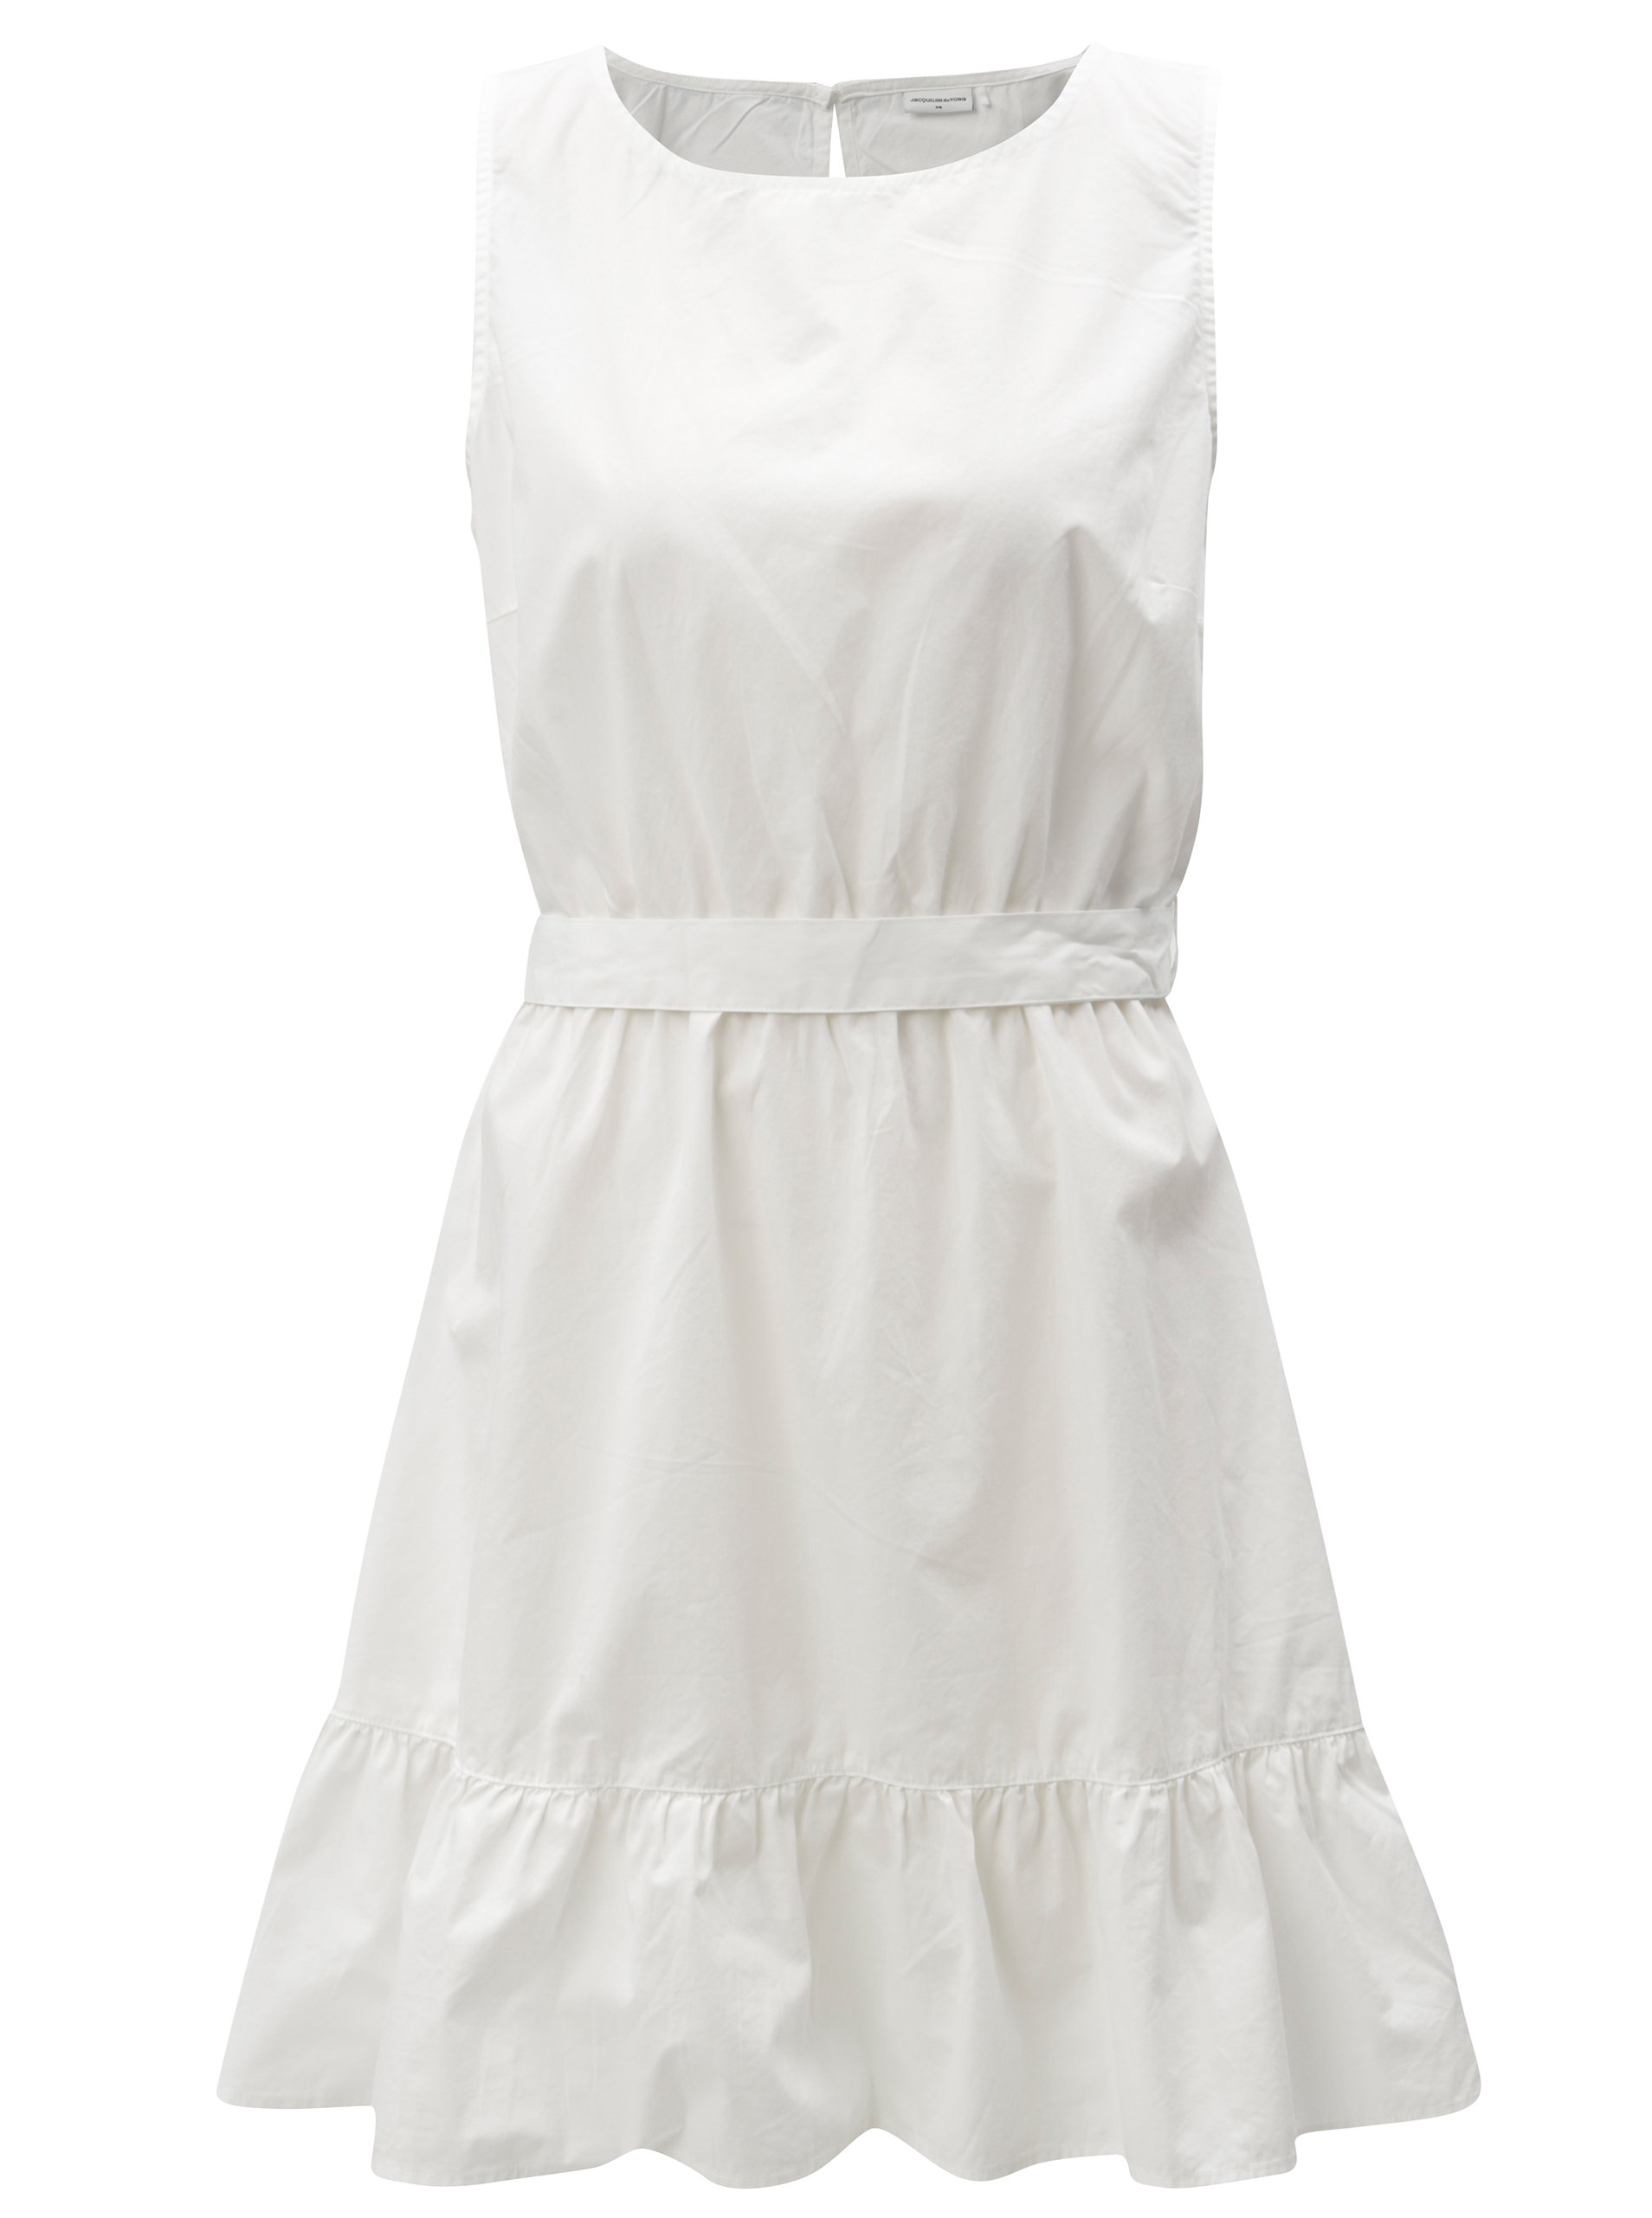 Biele šaty s volánom a zaväzovaním Jacqueline de Yong Damilla ... 10ea37bc697